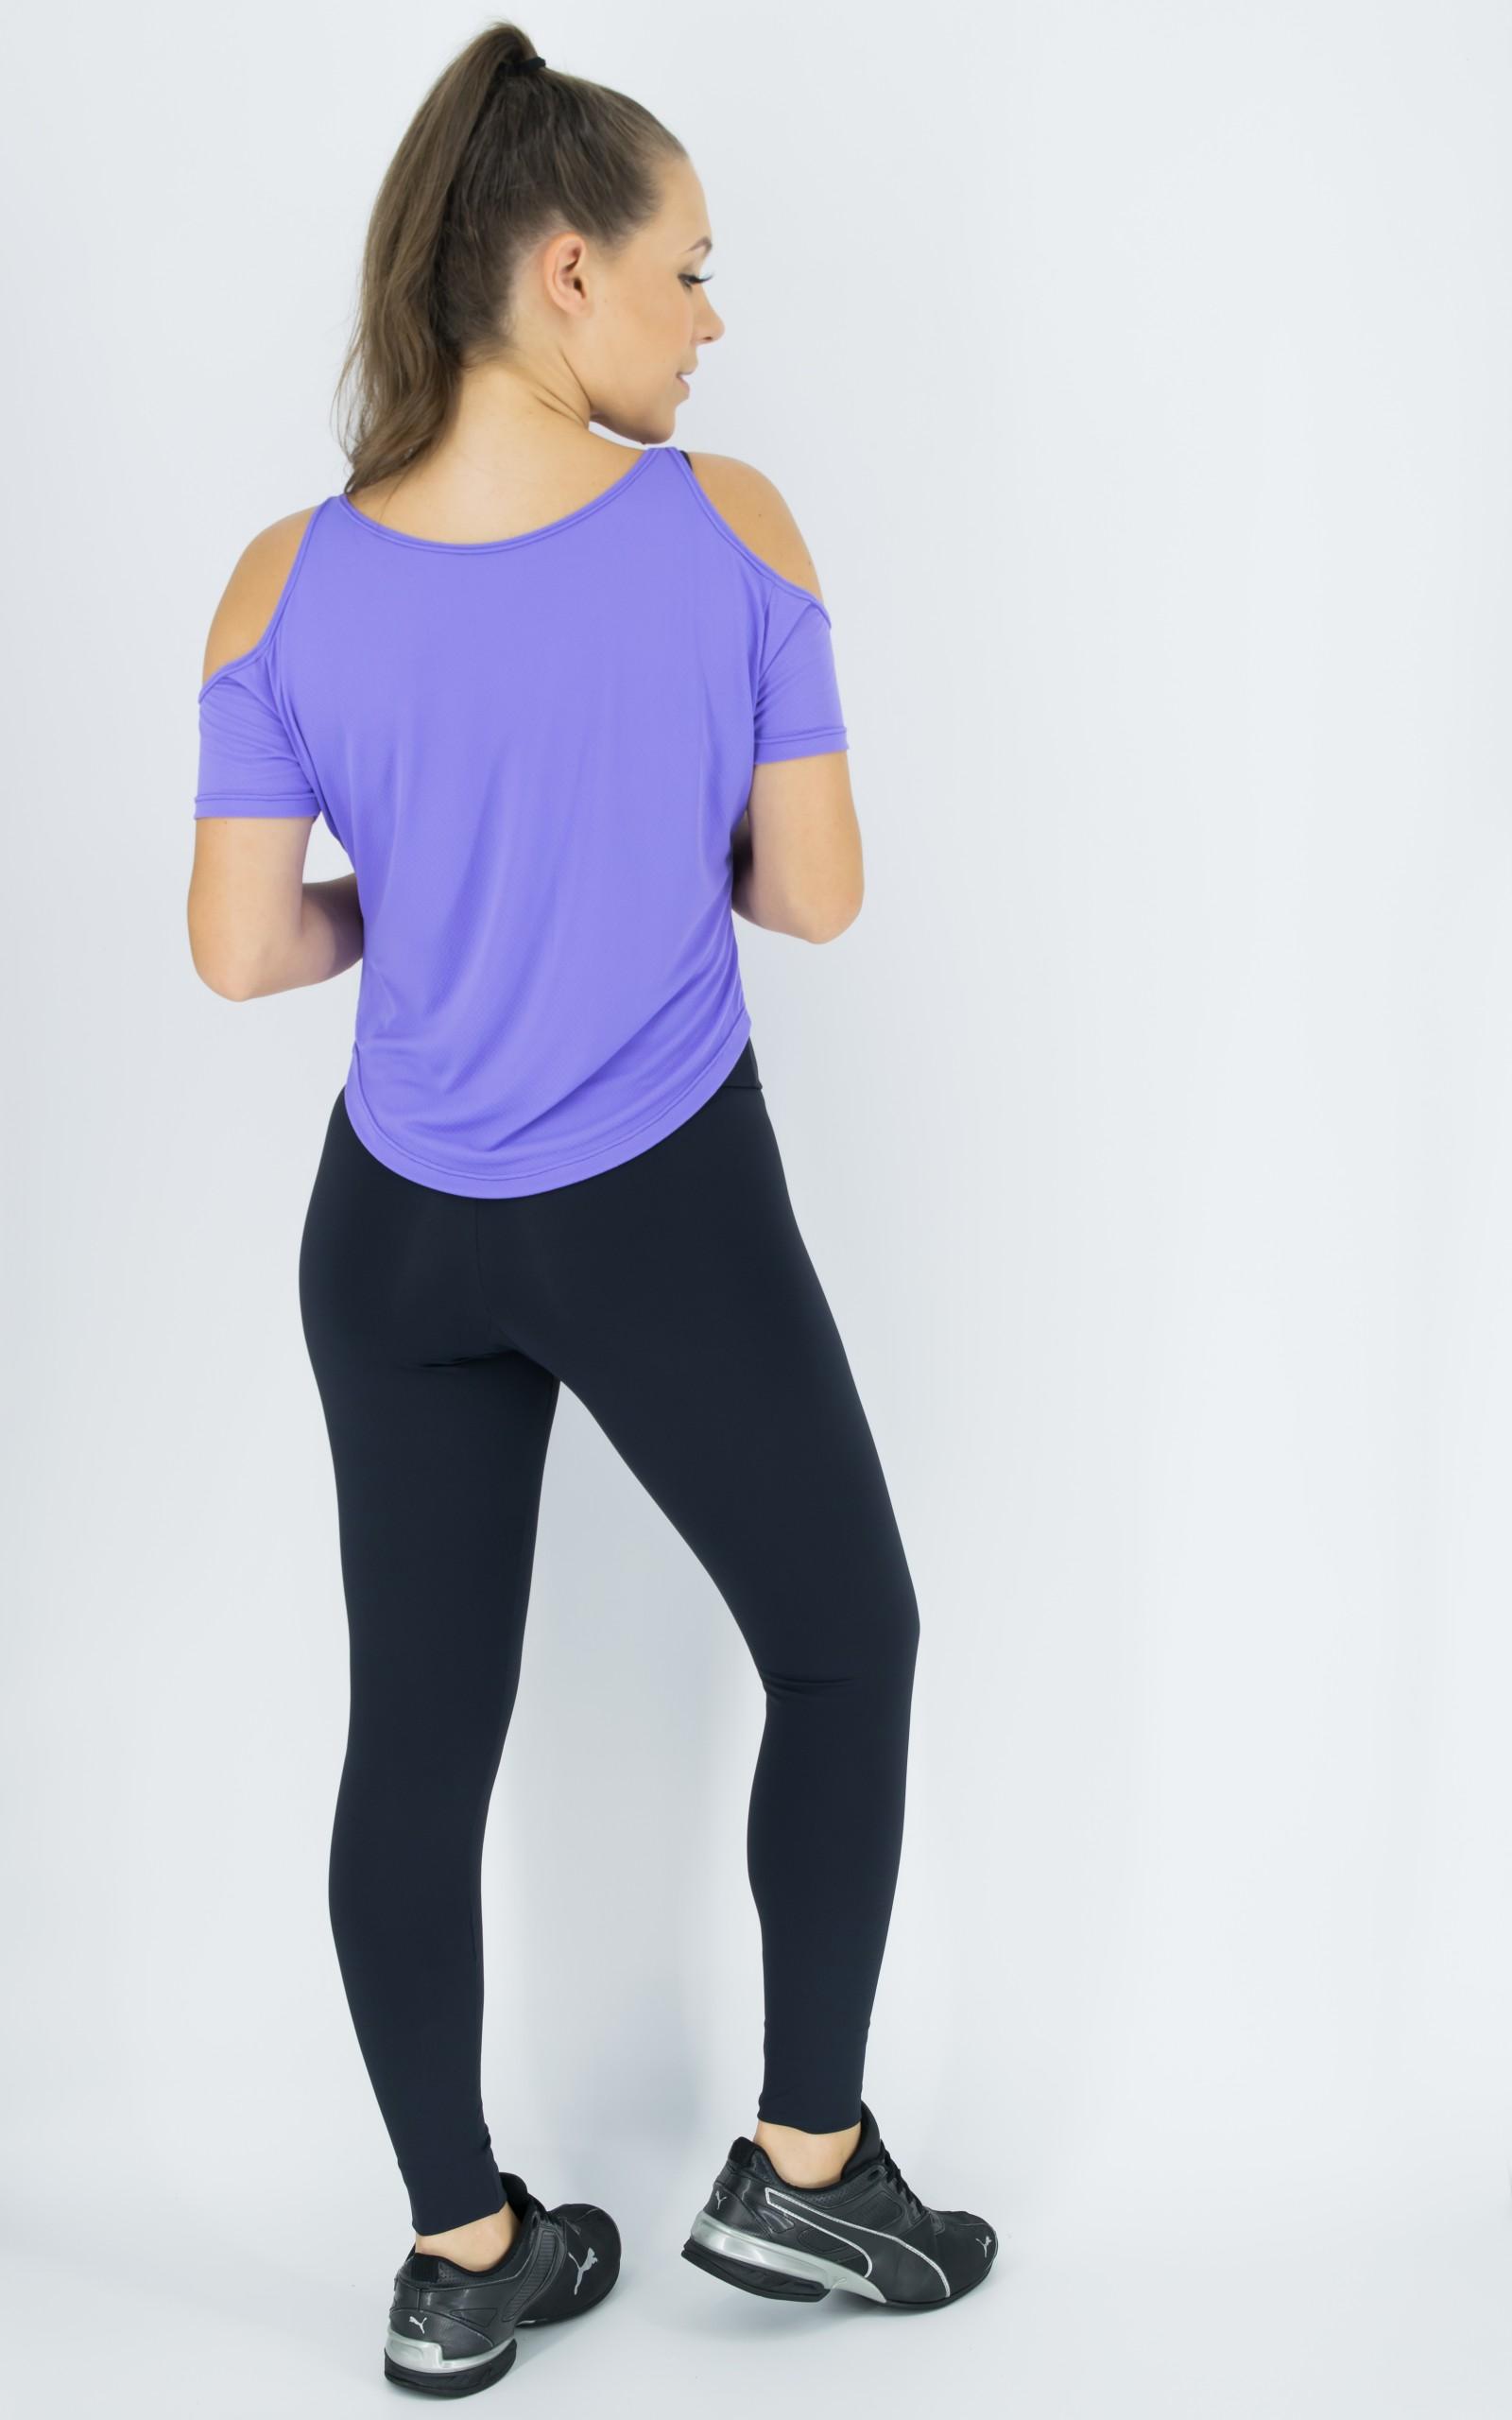 Blusa Like Lilás, Coleção Move Your Body - NKT Fitwear Moda Fitness